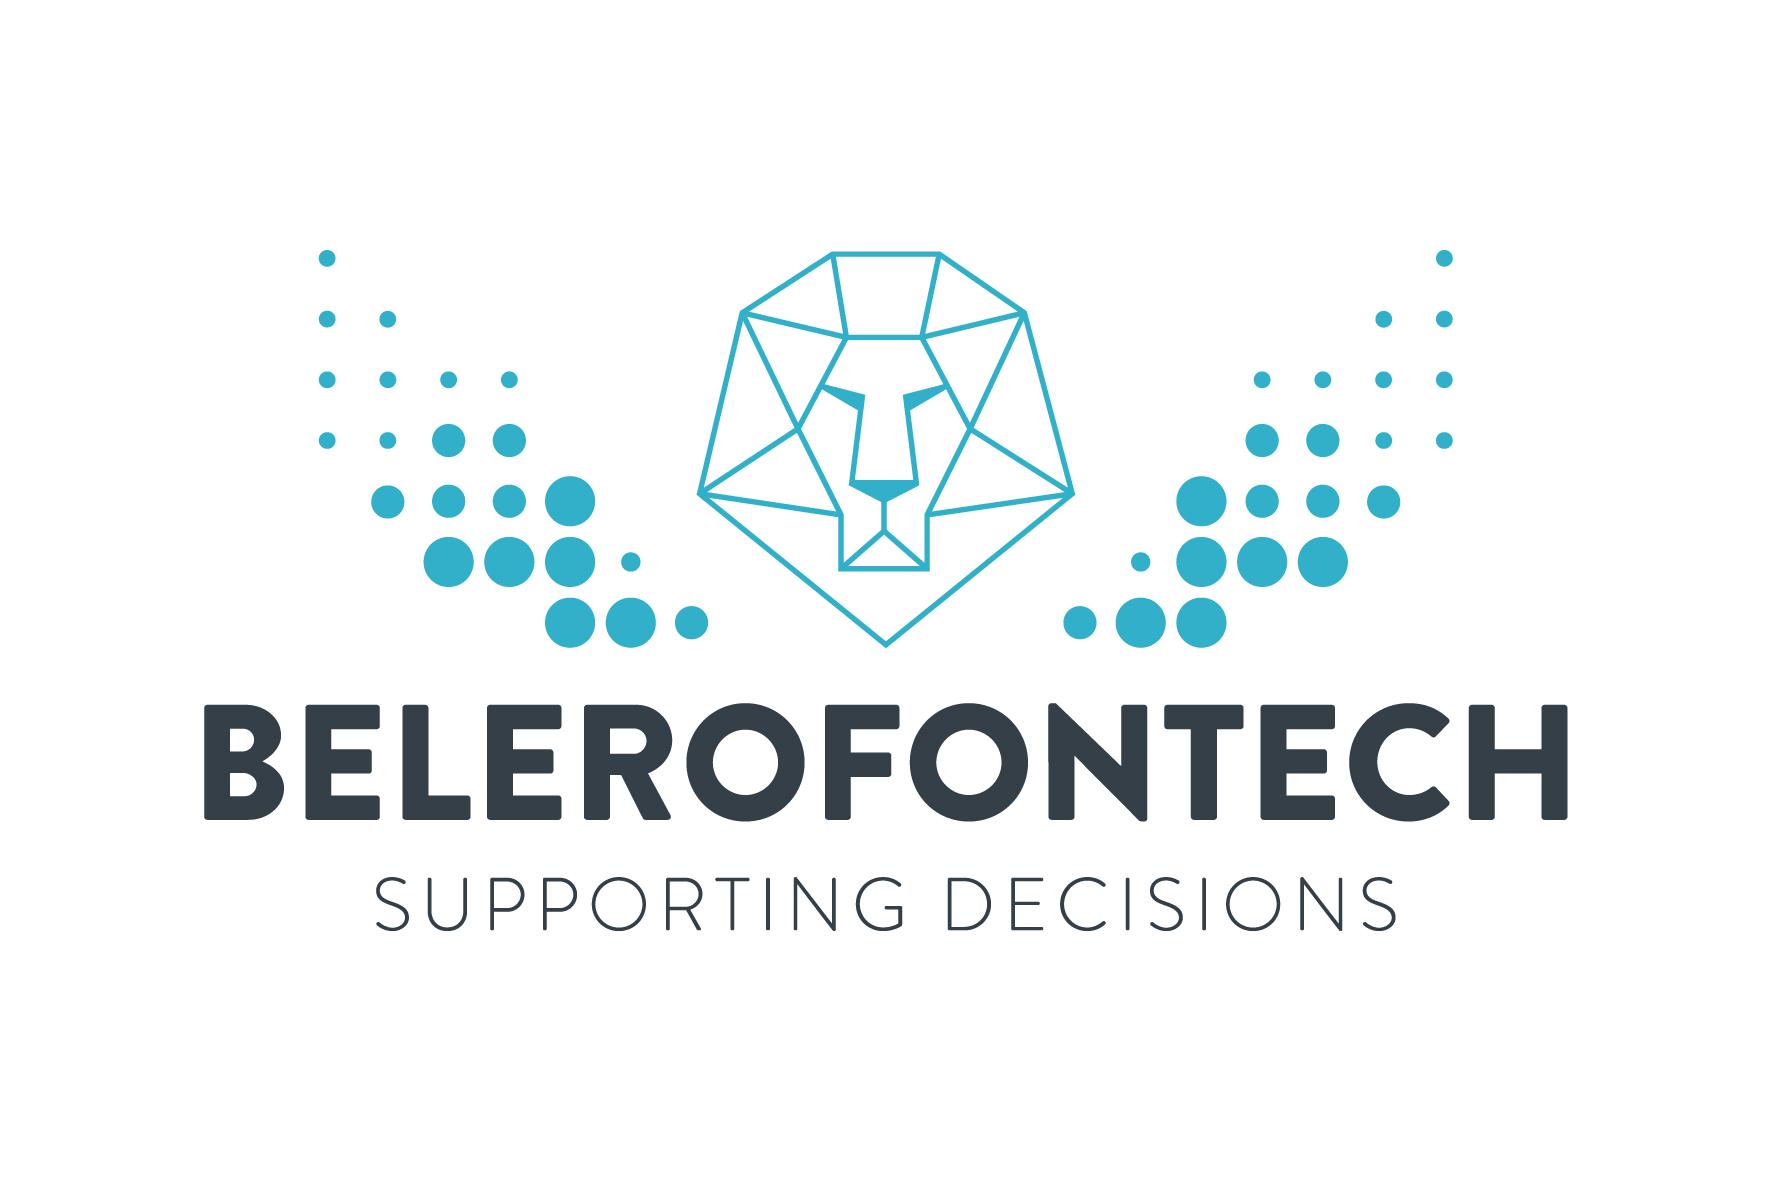 Belerofontech Color